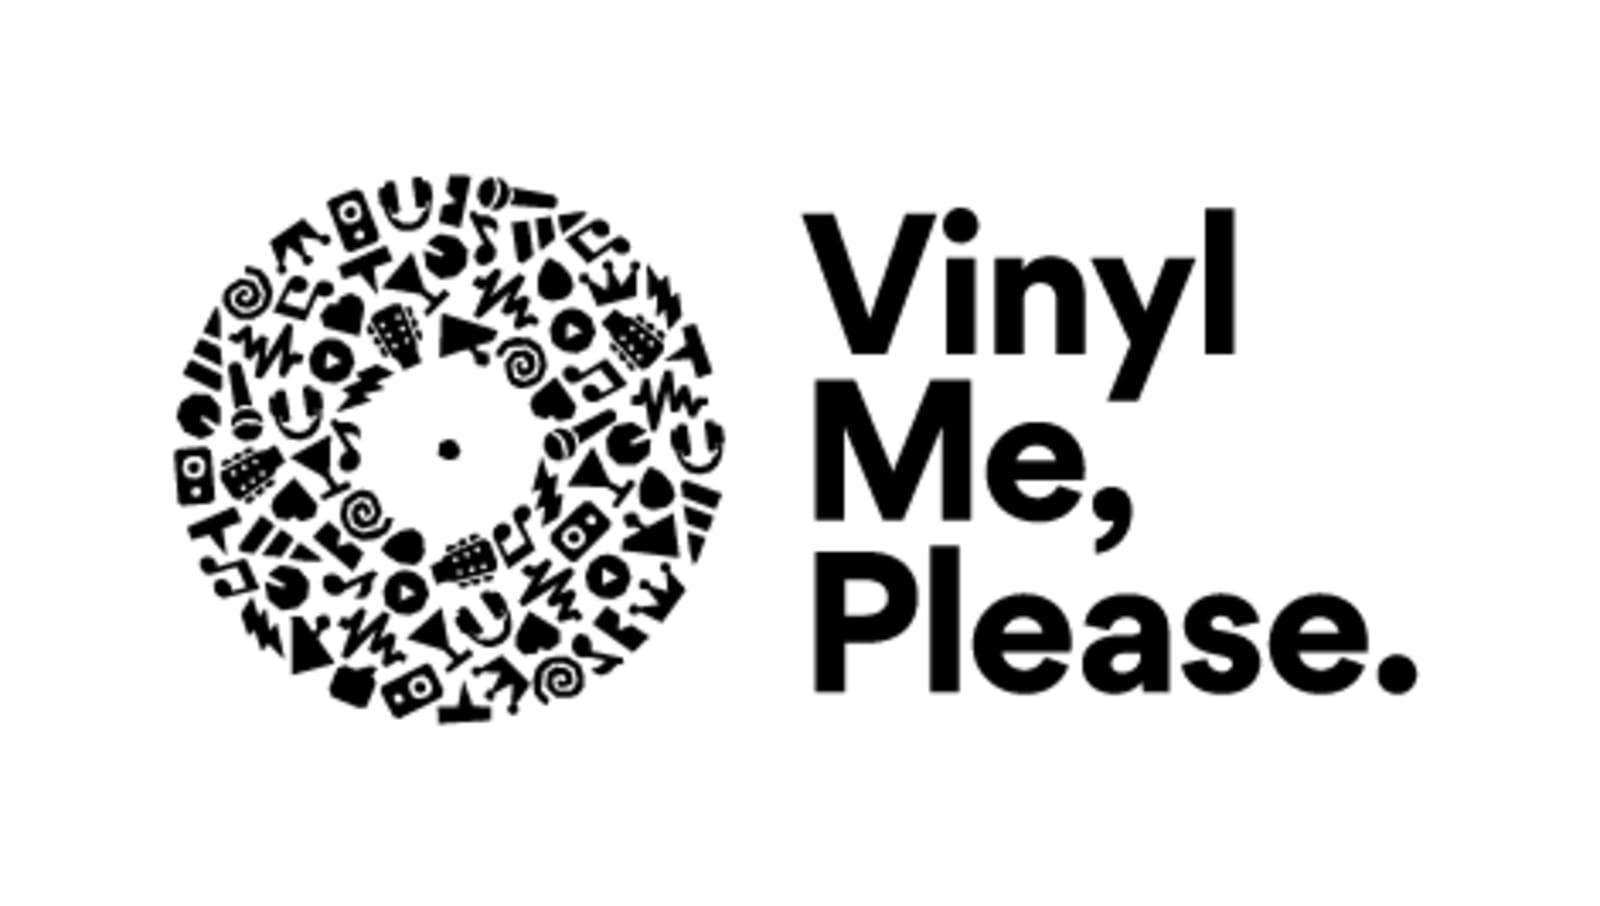 Music streaming is fueling vinyl's resurgence